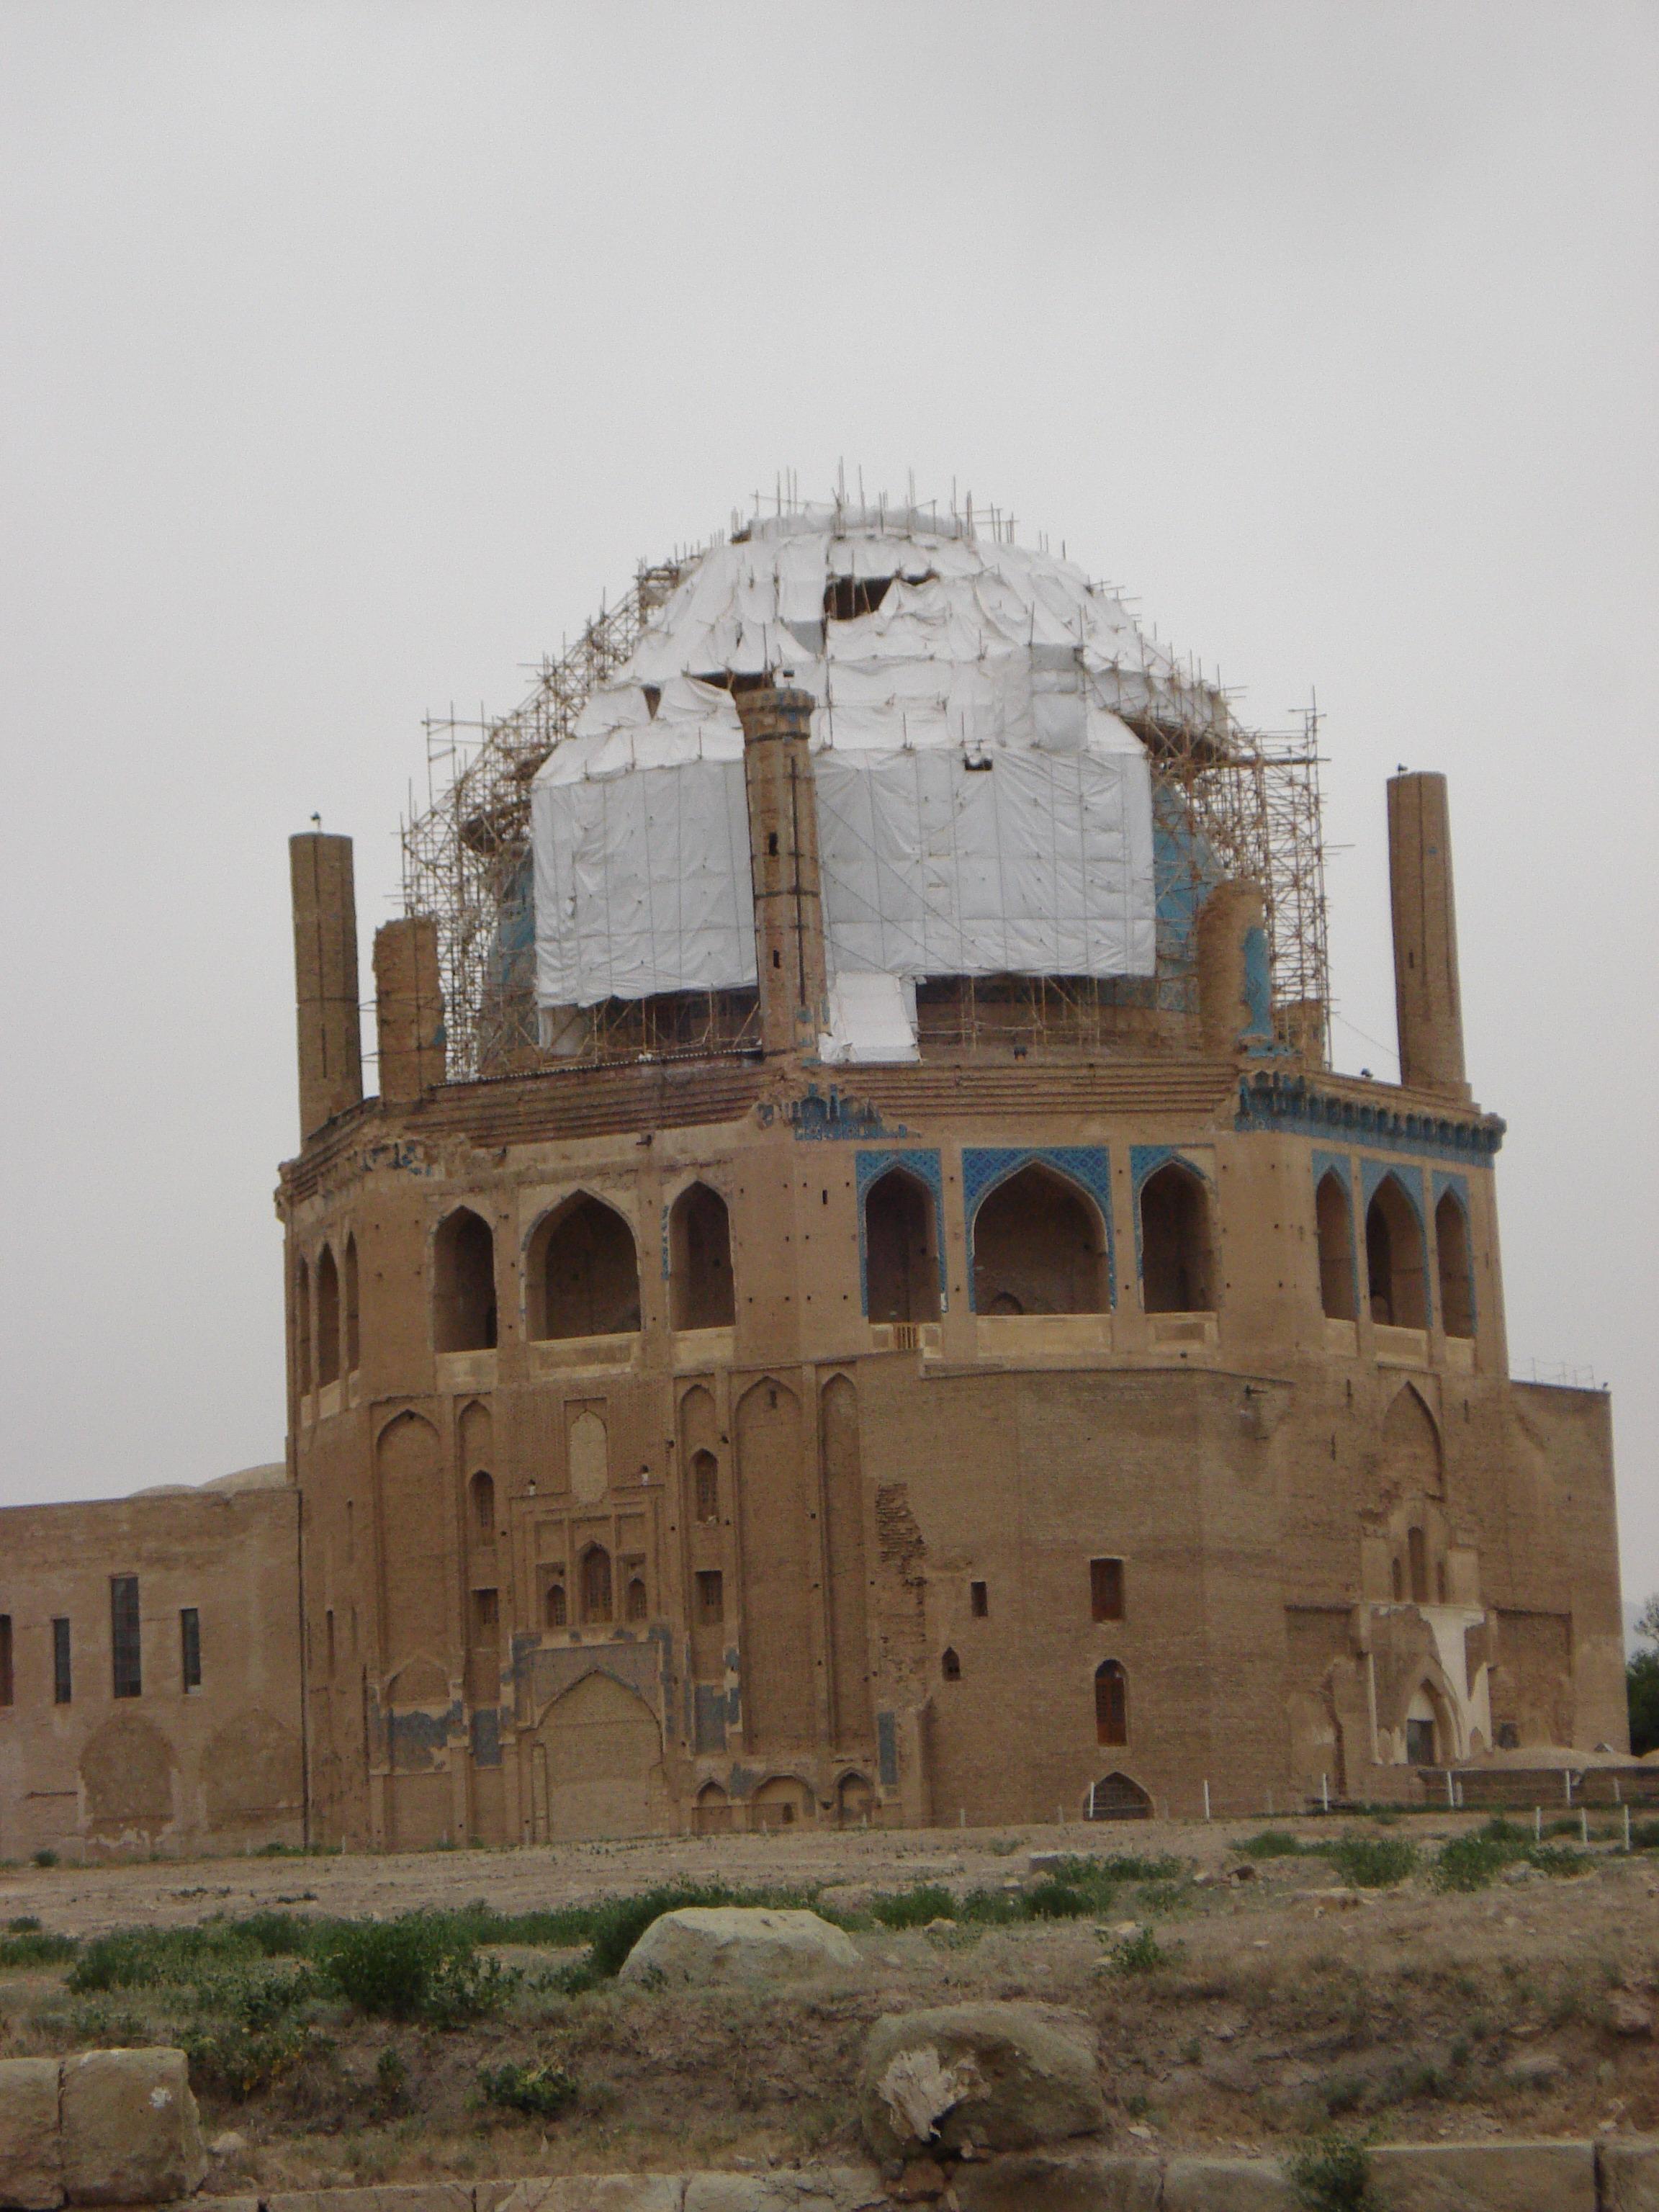 Best Kitchen Gallery: Imagining Islamic Asthetics 31 Islamic Persian Architecture of Ancient Persian Architecture on rachelxblog.com